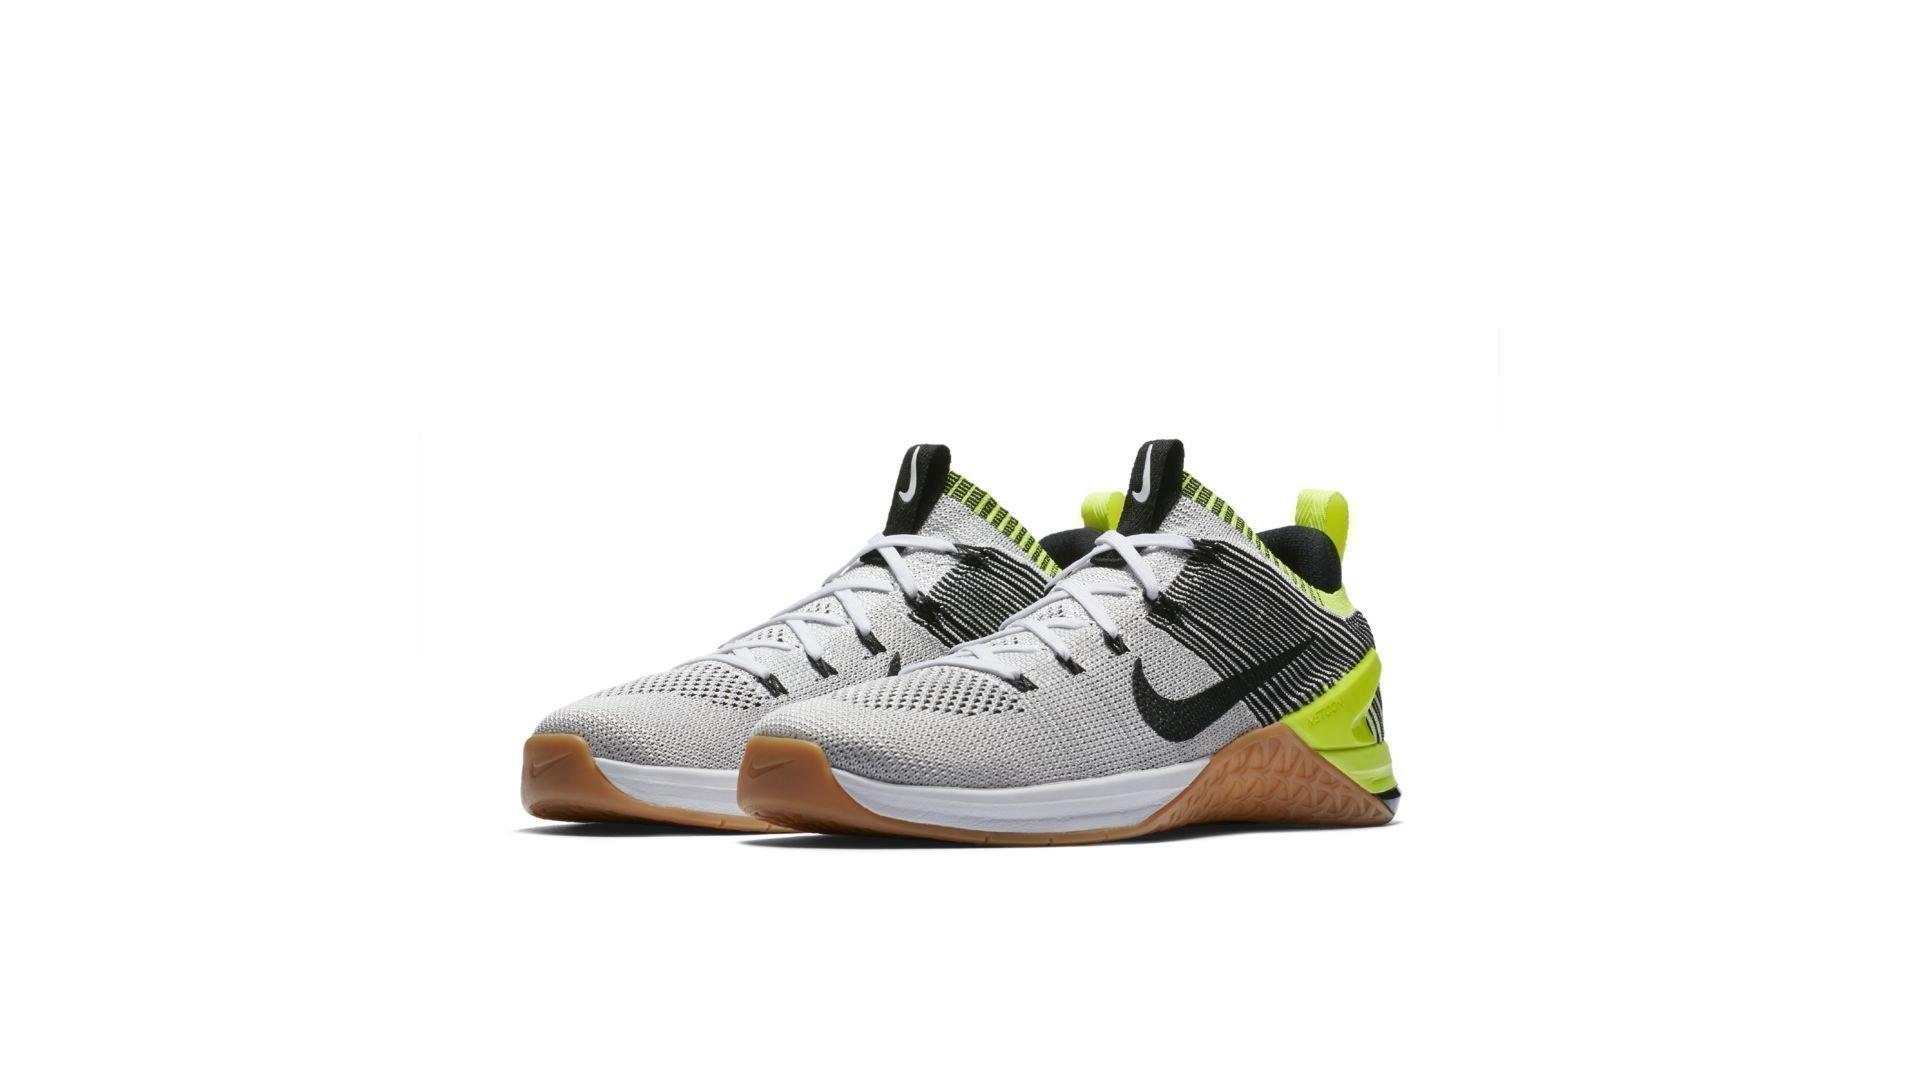 Nike Metcon DSX Flyknit 2 White Black Volt Gum (924423-107)